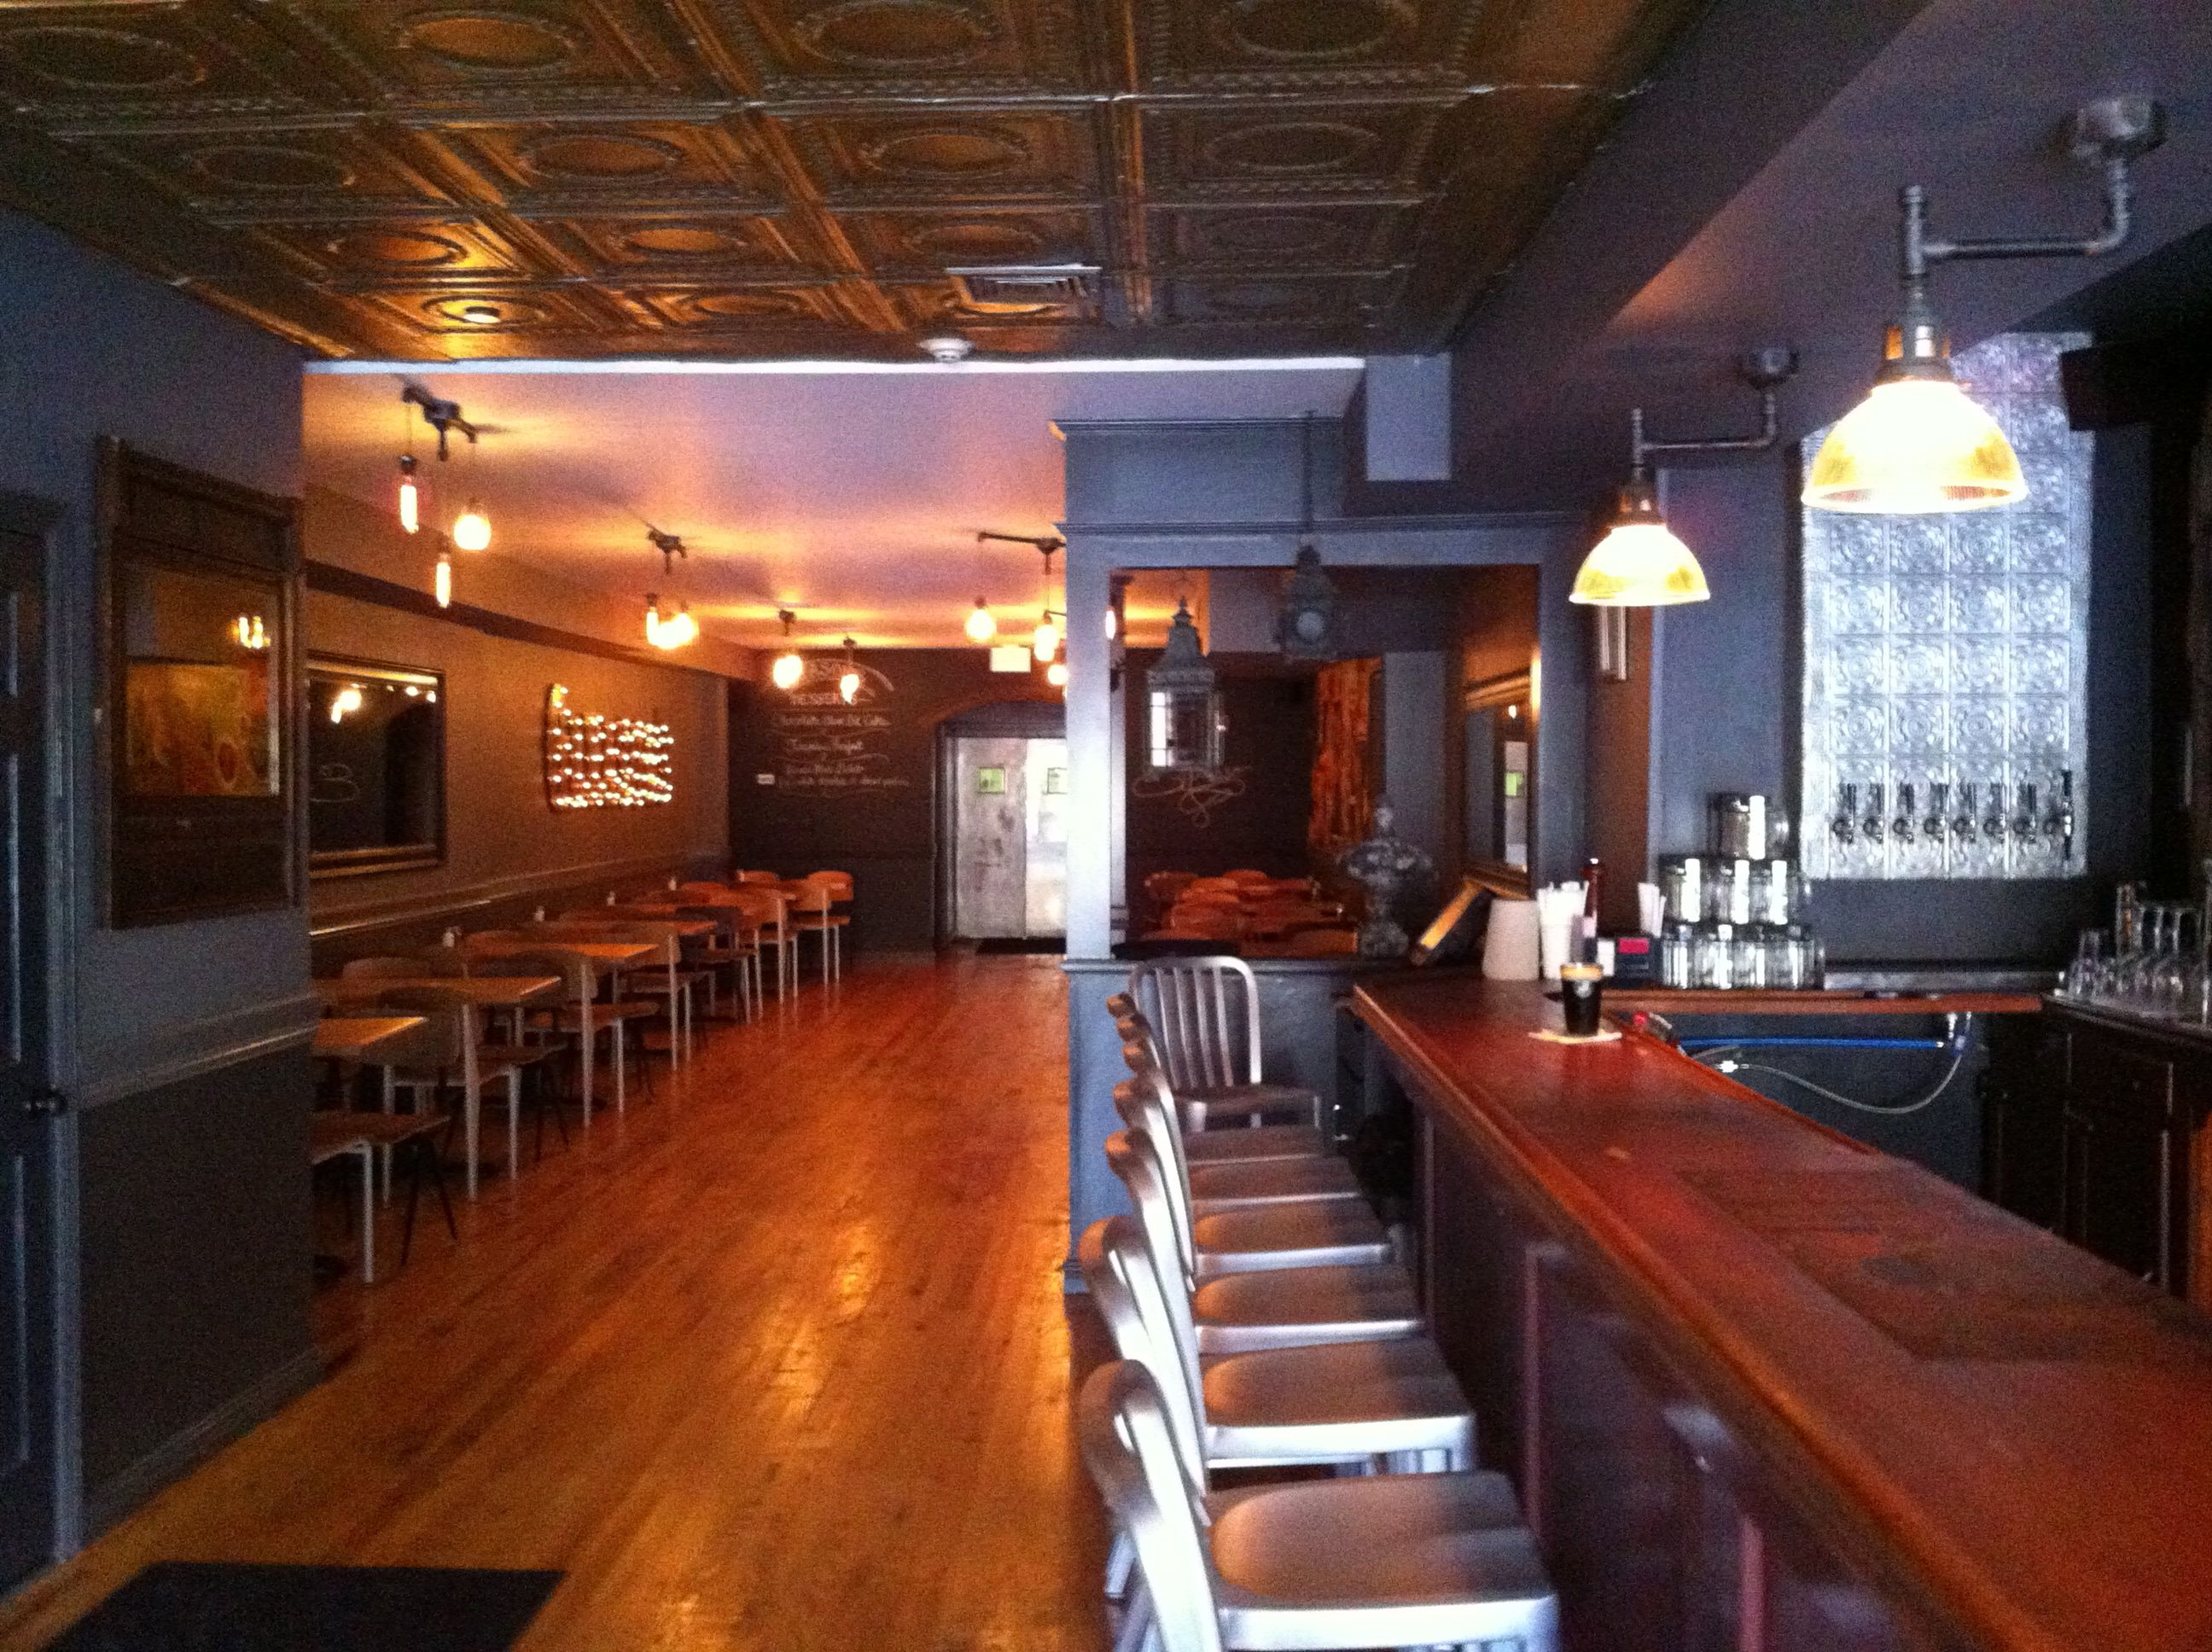 Gleason S Restaurant Peekskill Ny Downtown Peekskill  # Muebles Peekskill